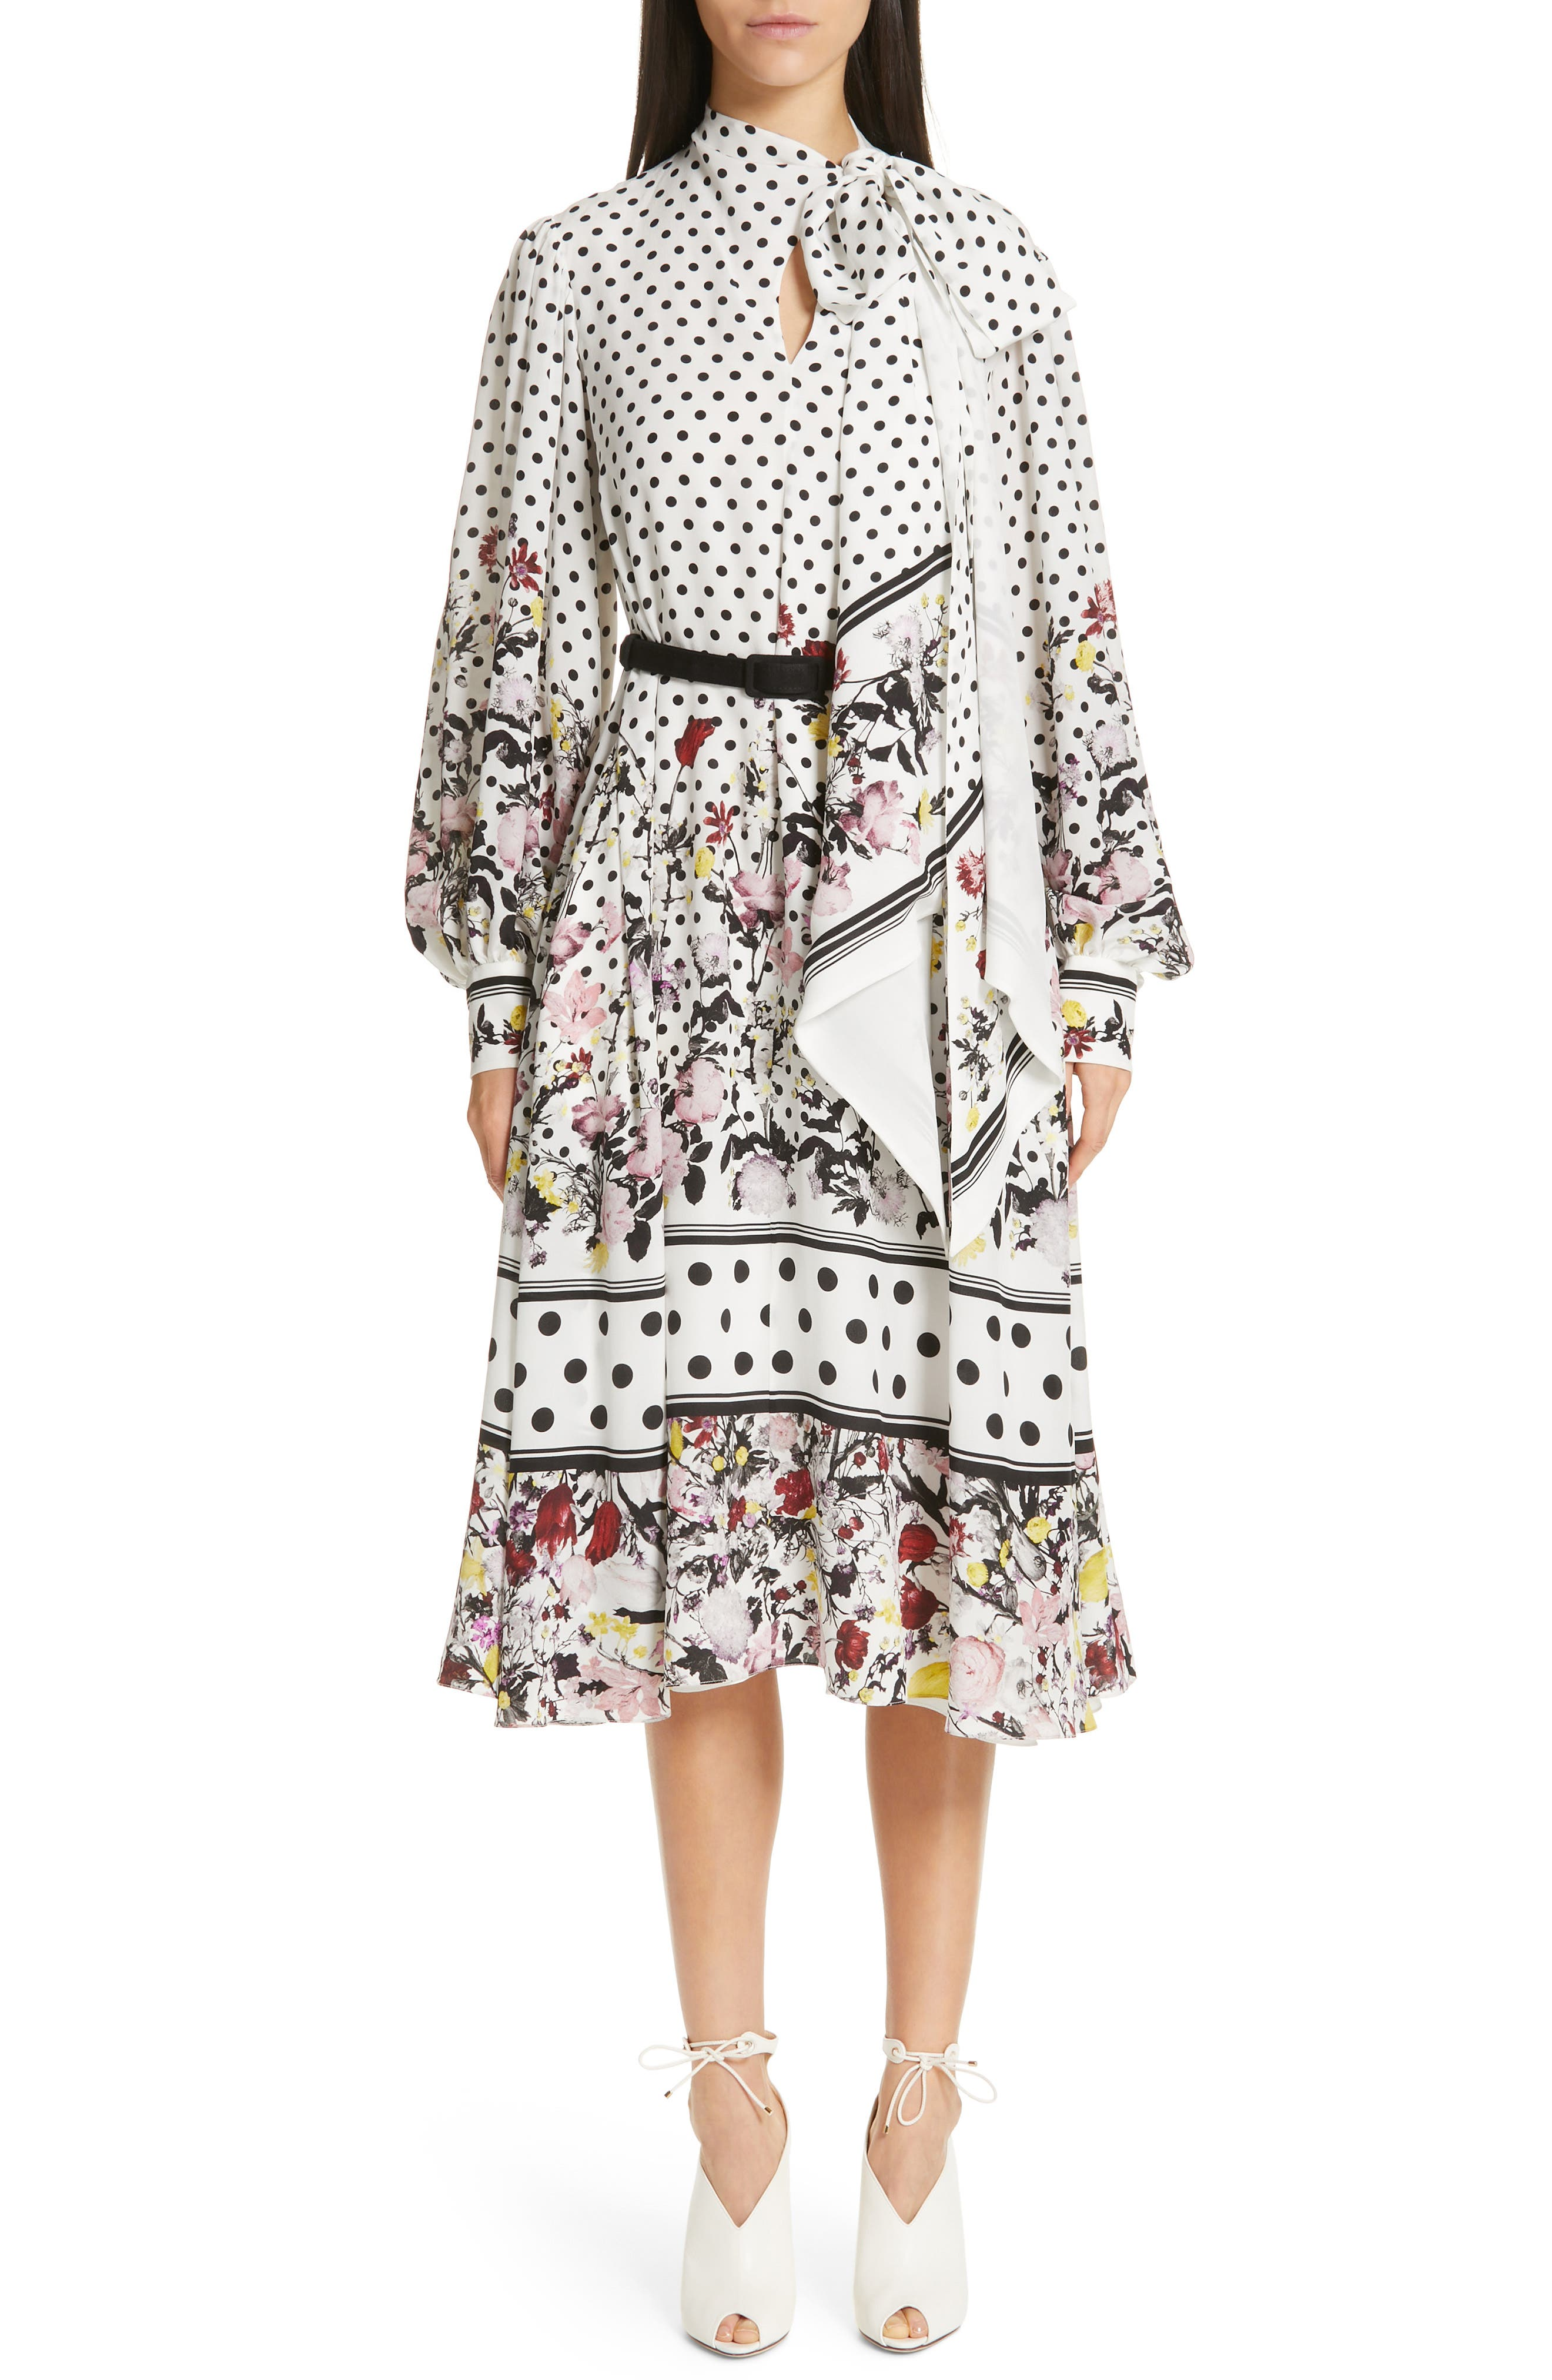 Erdem Tie Neck Polka Dot & Floral Print Dress, US / 8 UK - White